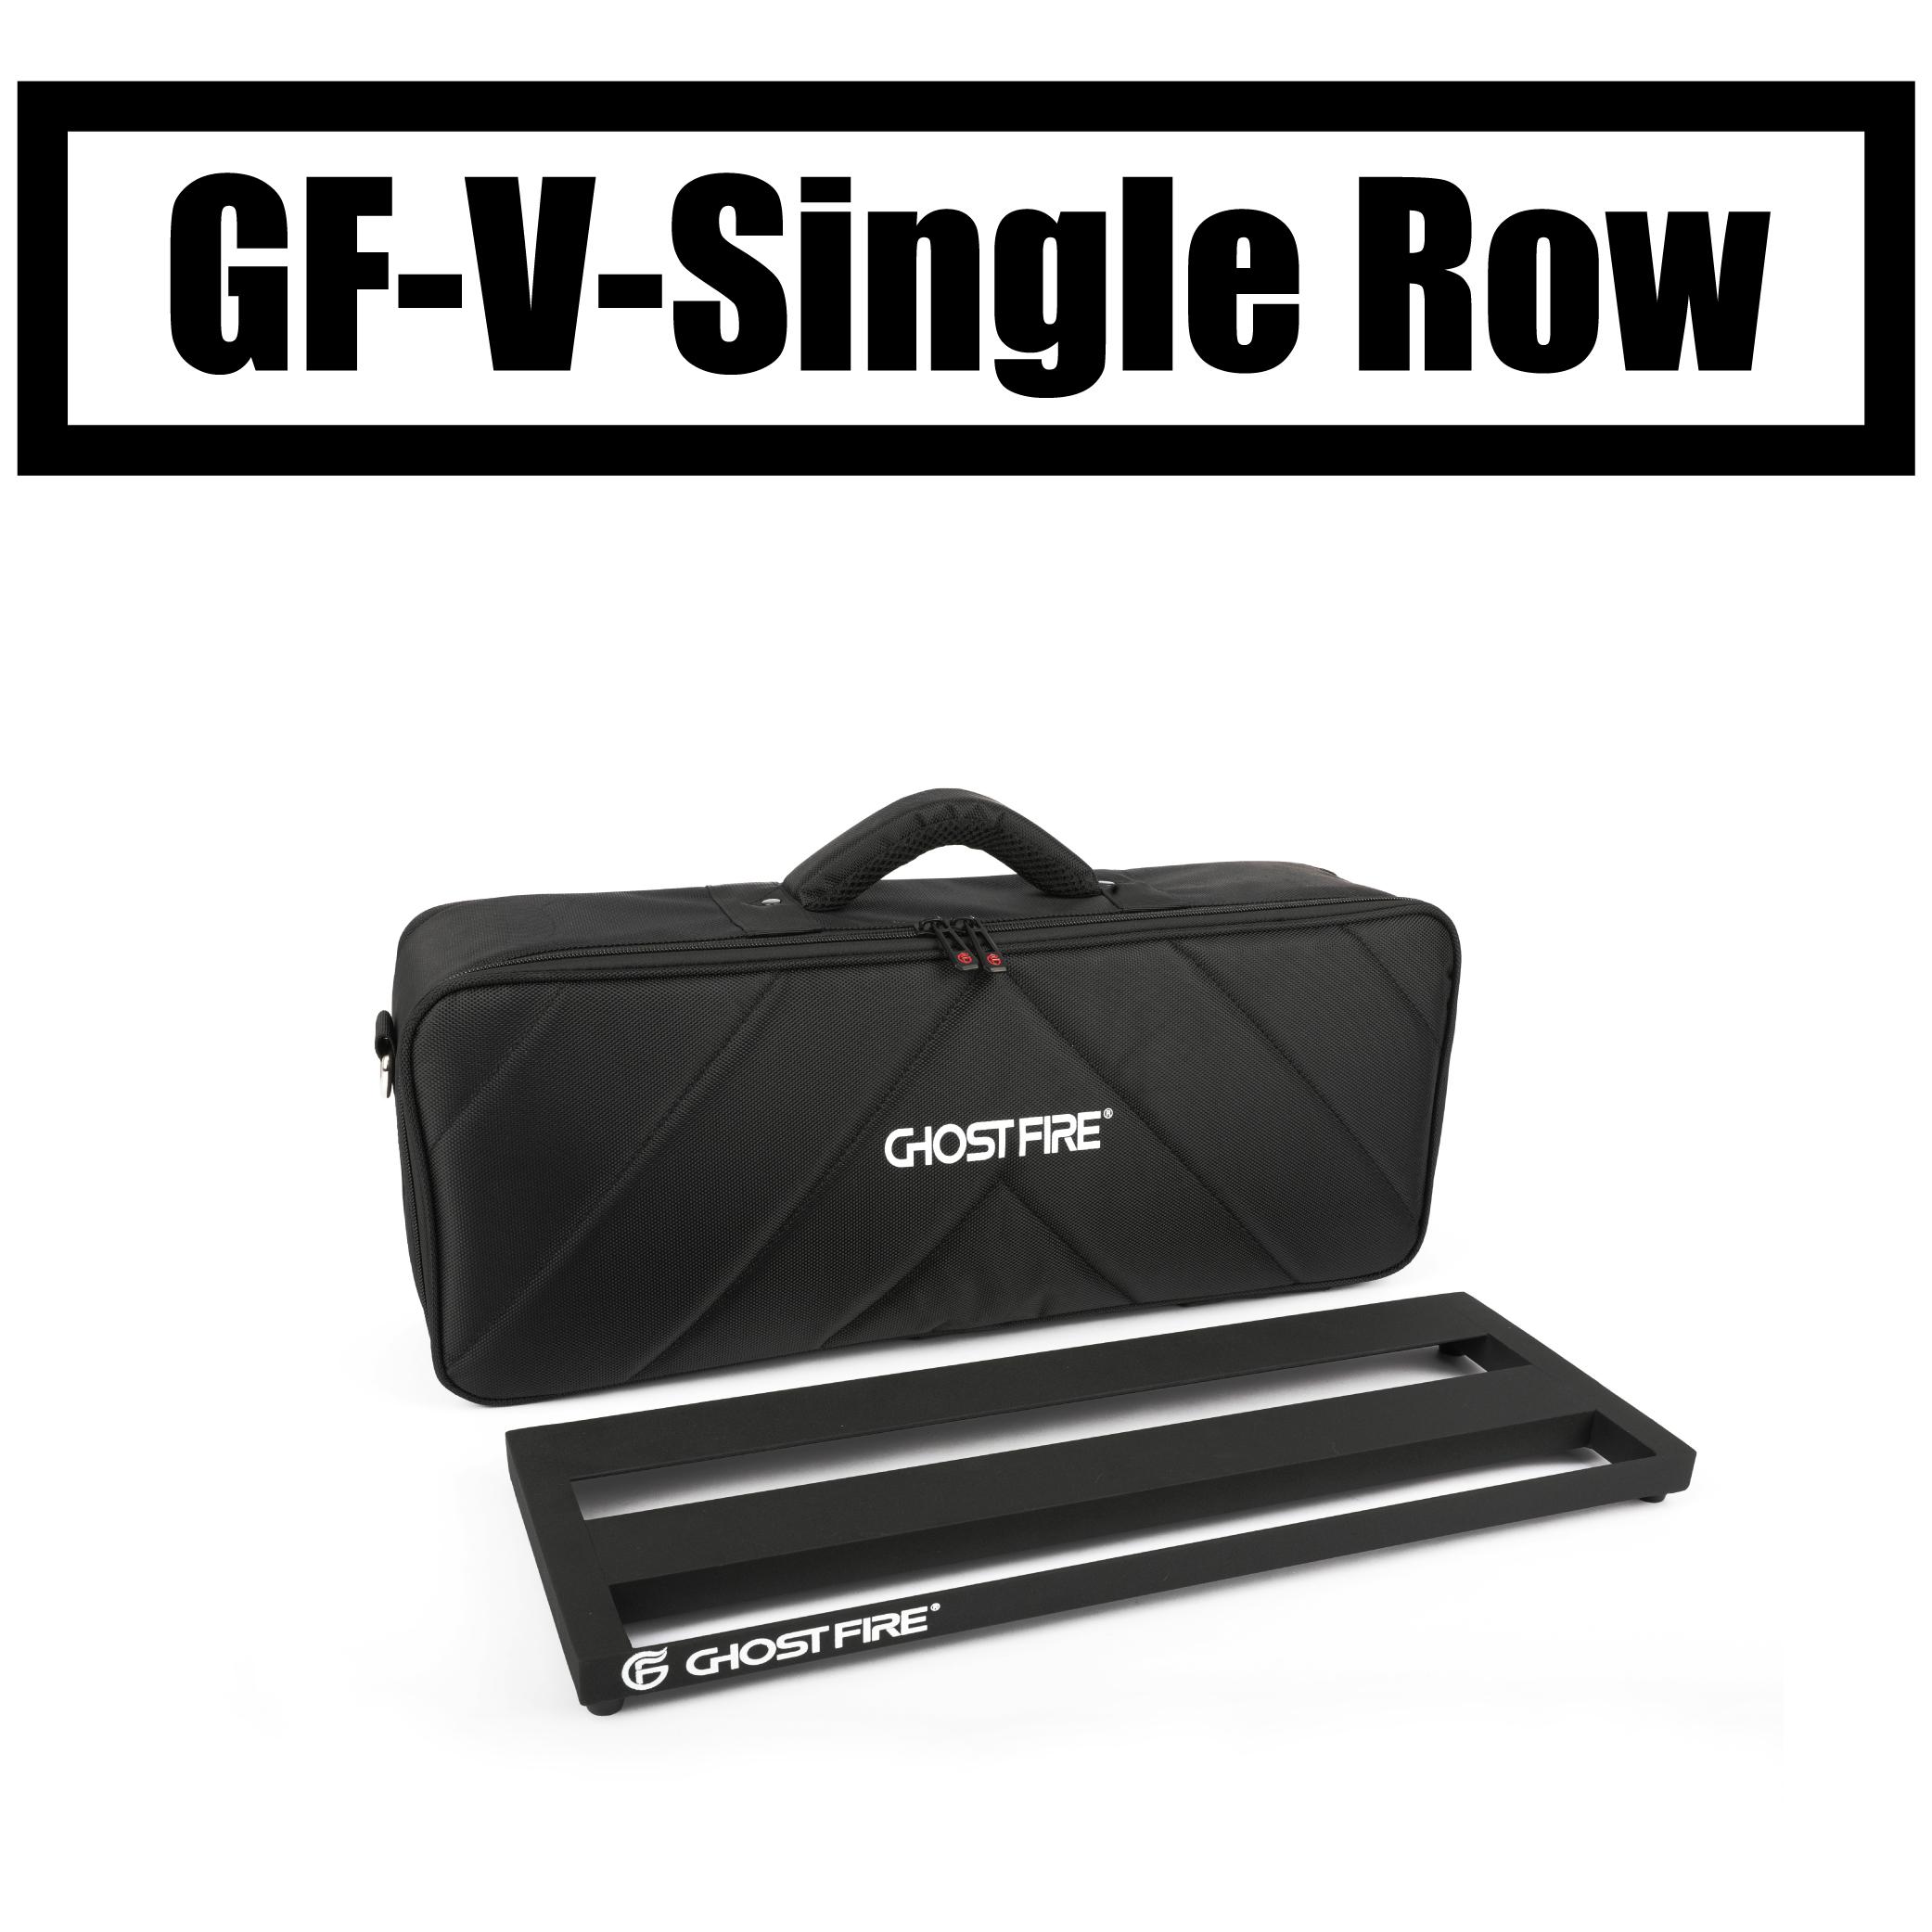 GF-V-Single Row